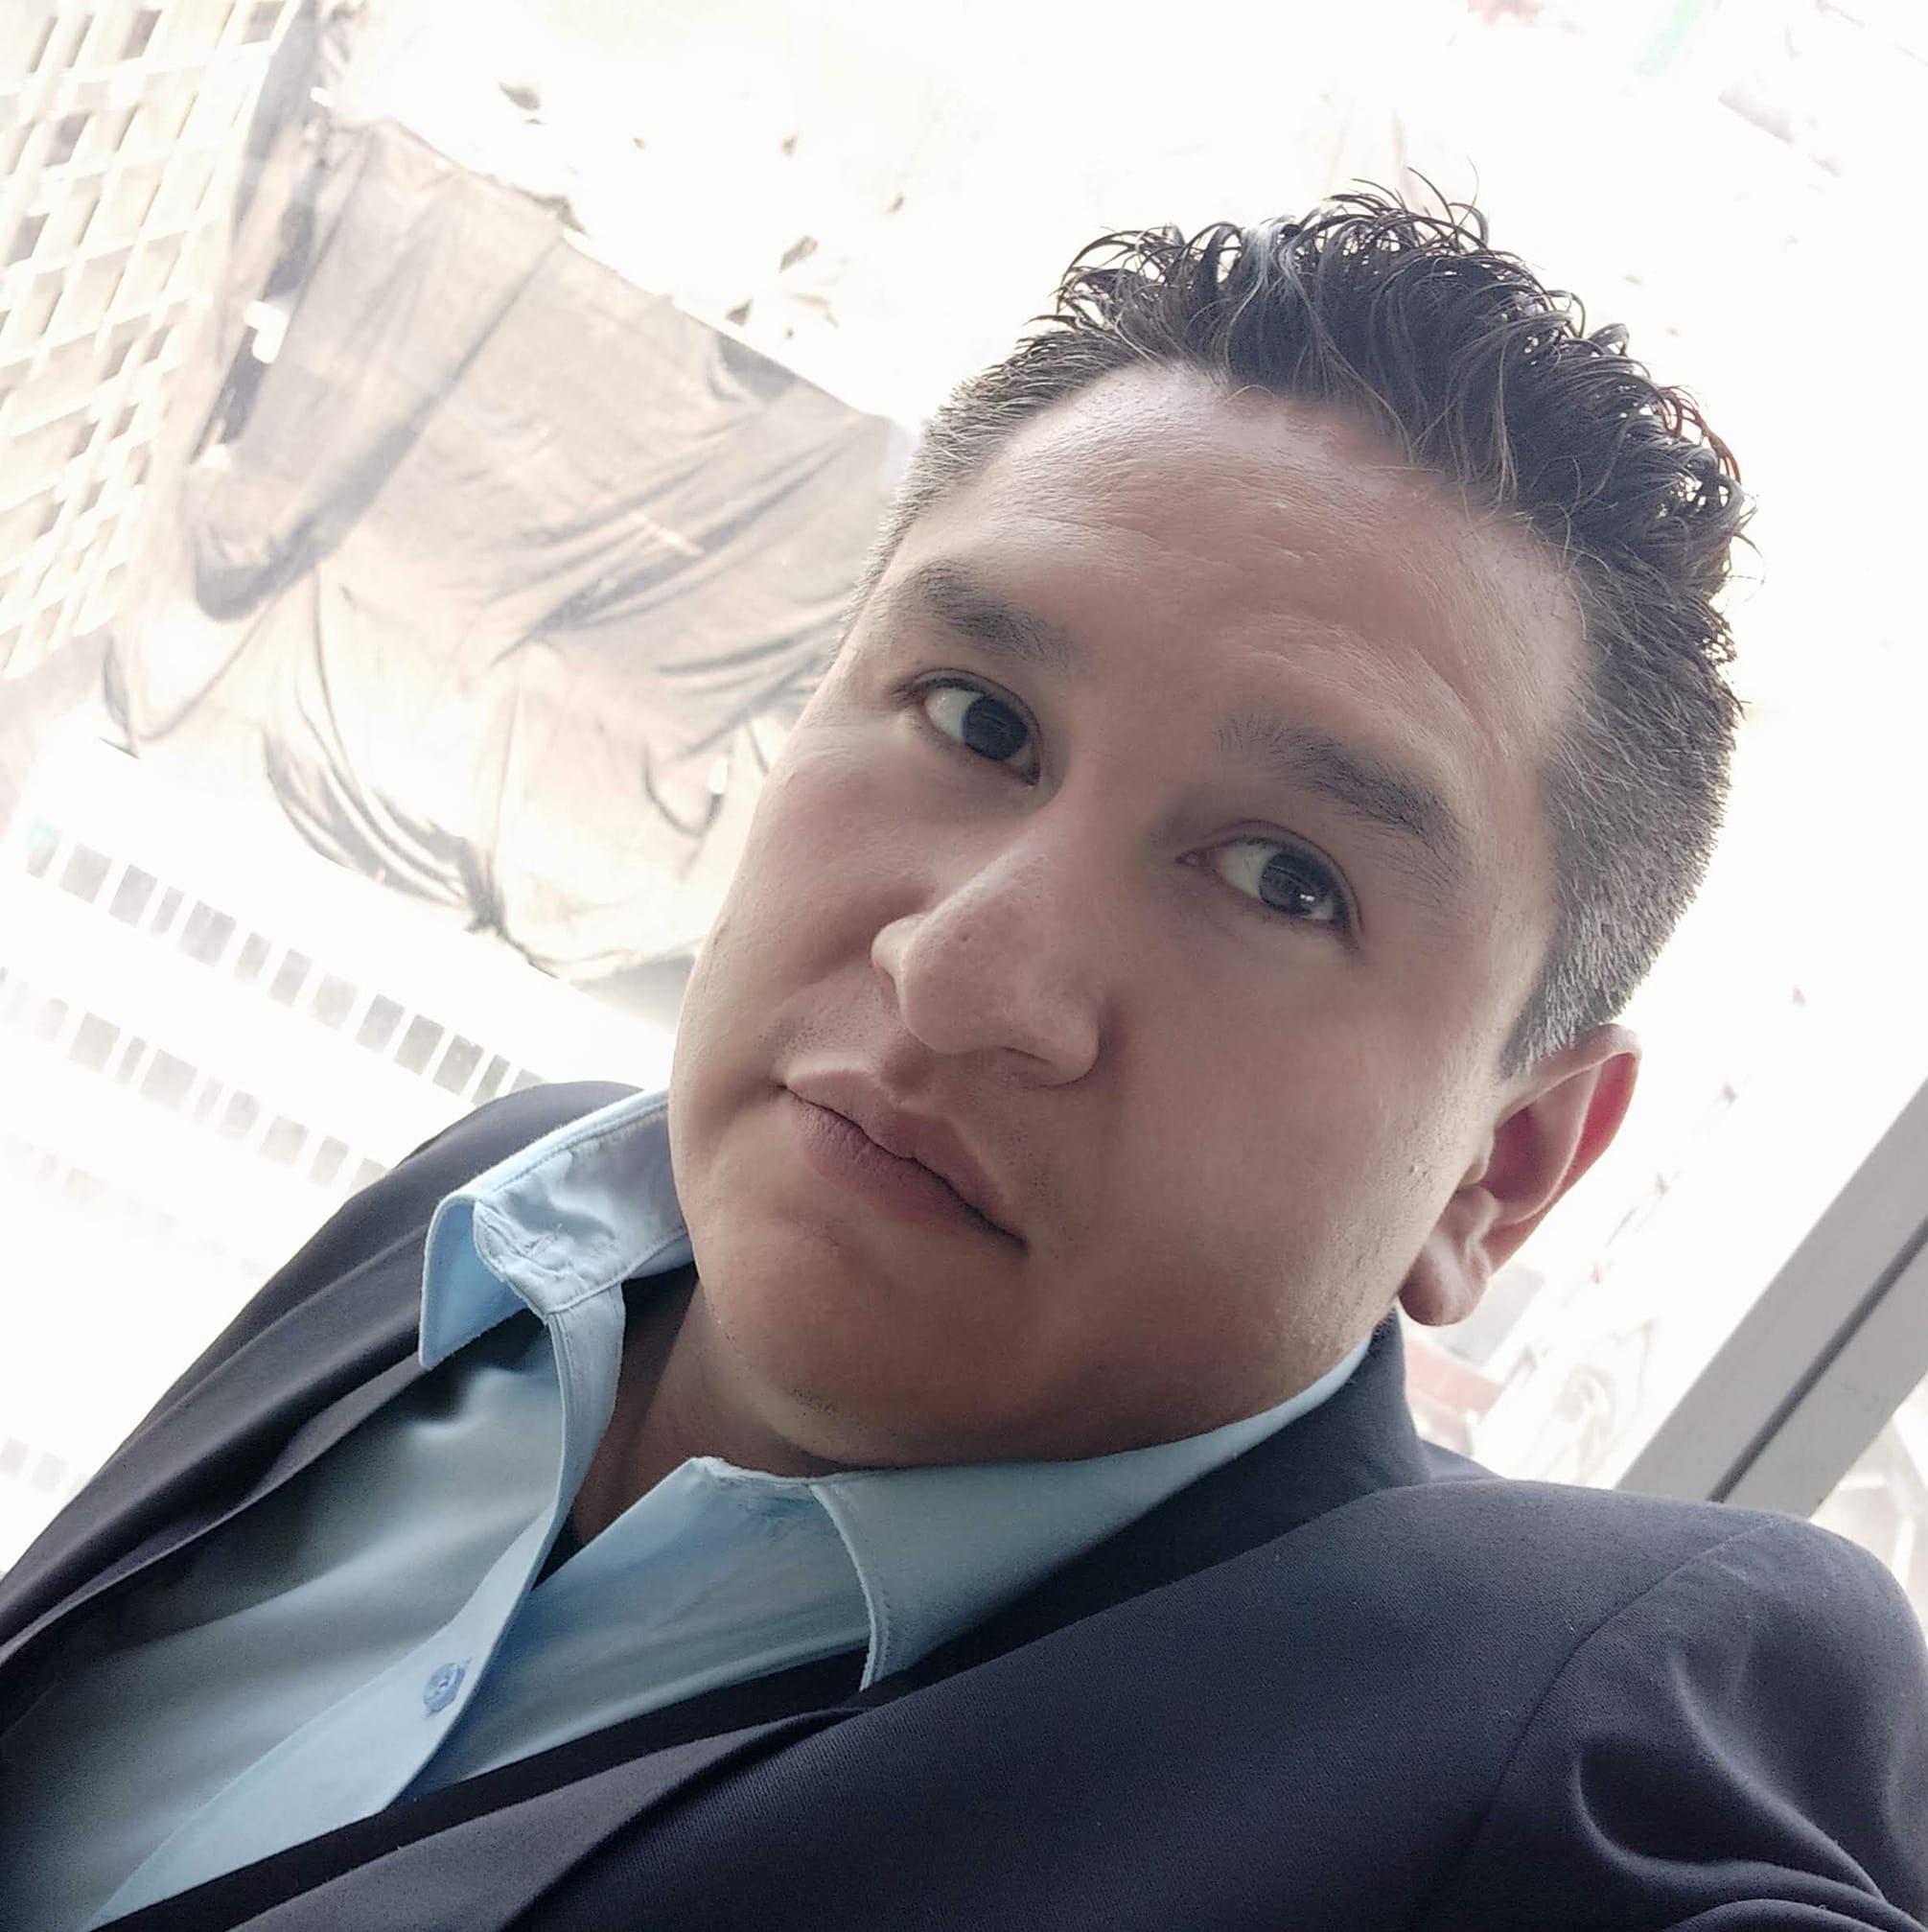 Aaron Hernandez Vega